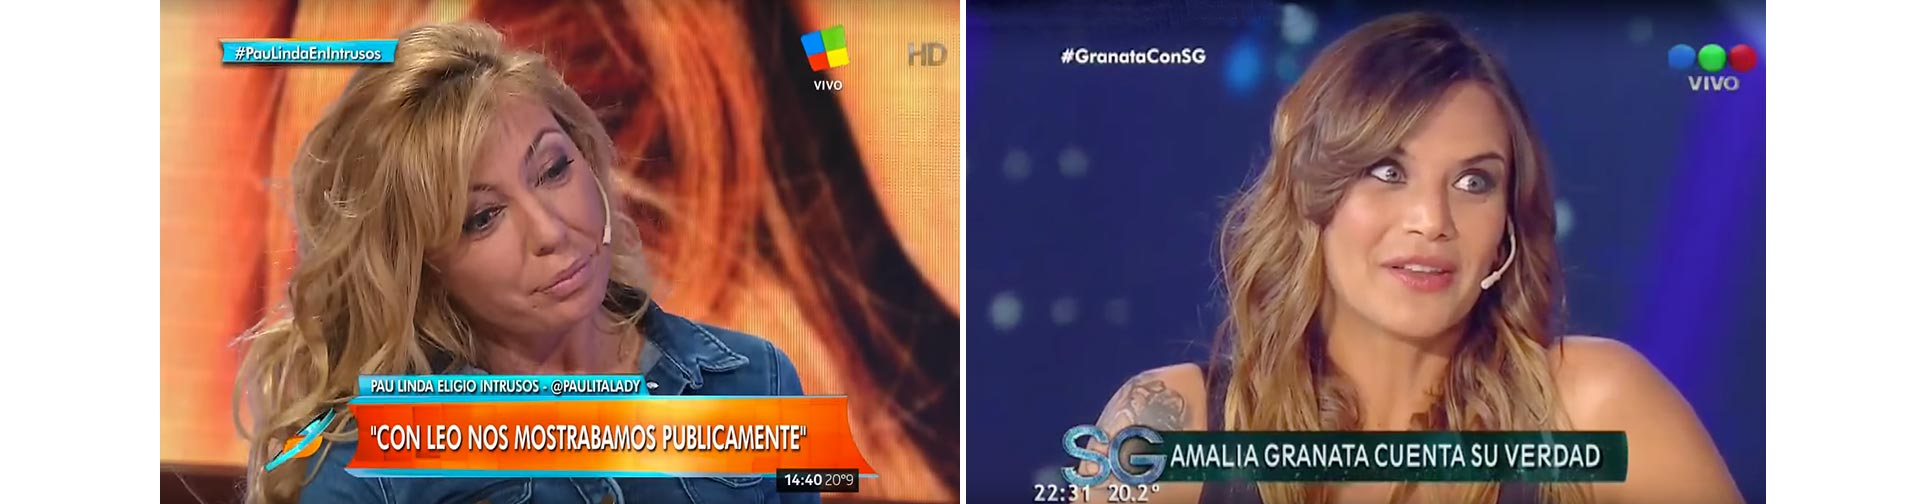 amalia_cuernos_caja_3